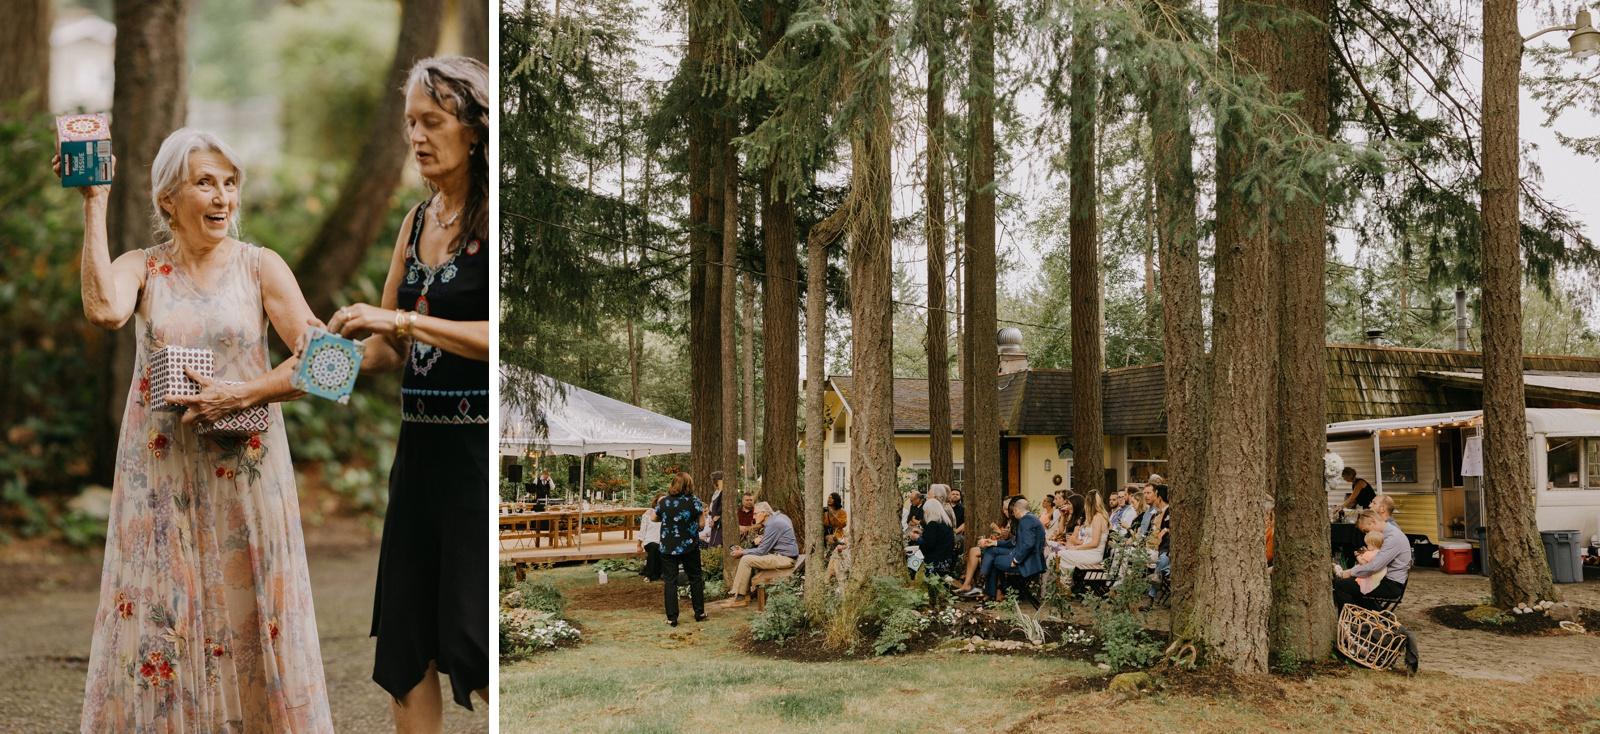 Matthew and Autumn Intimate Outdoor Backyard Wedding_0099